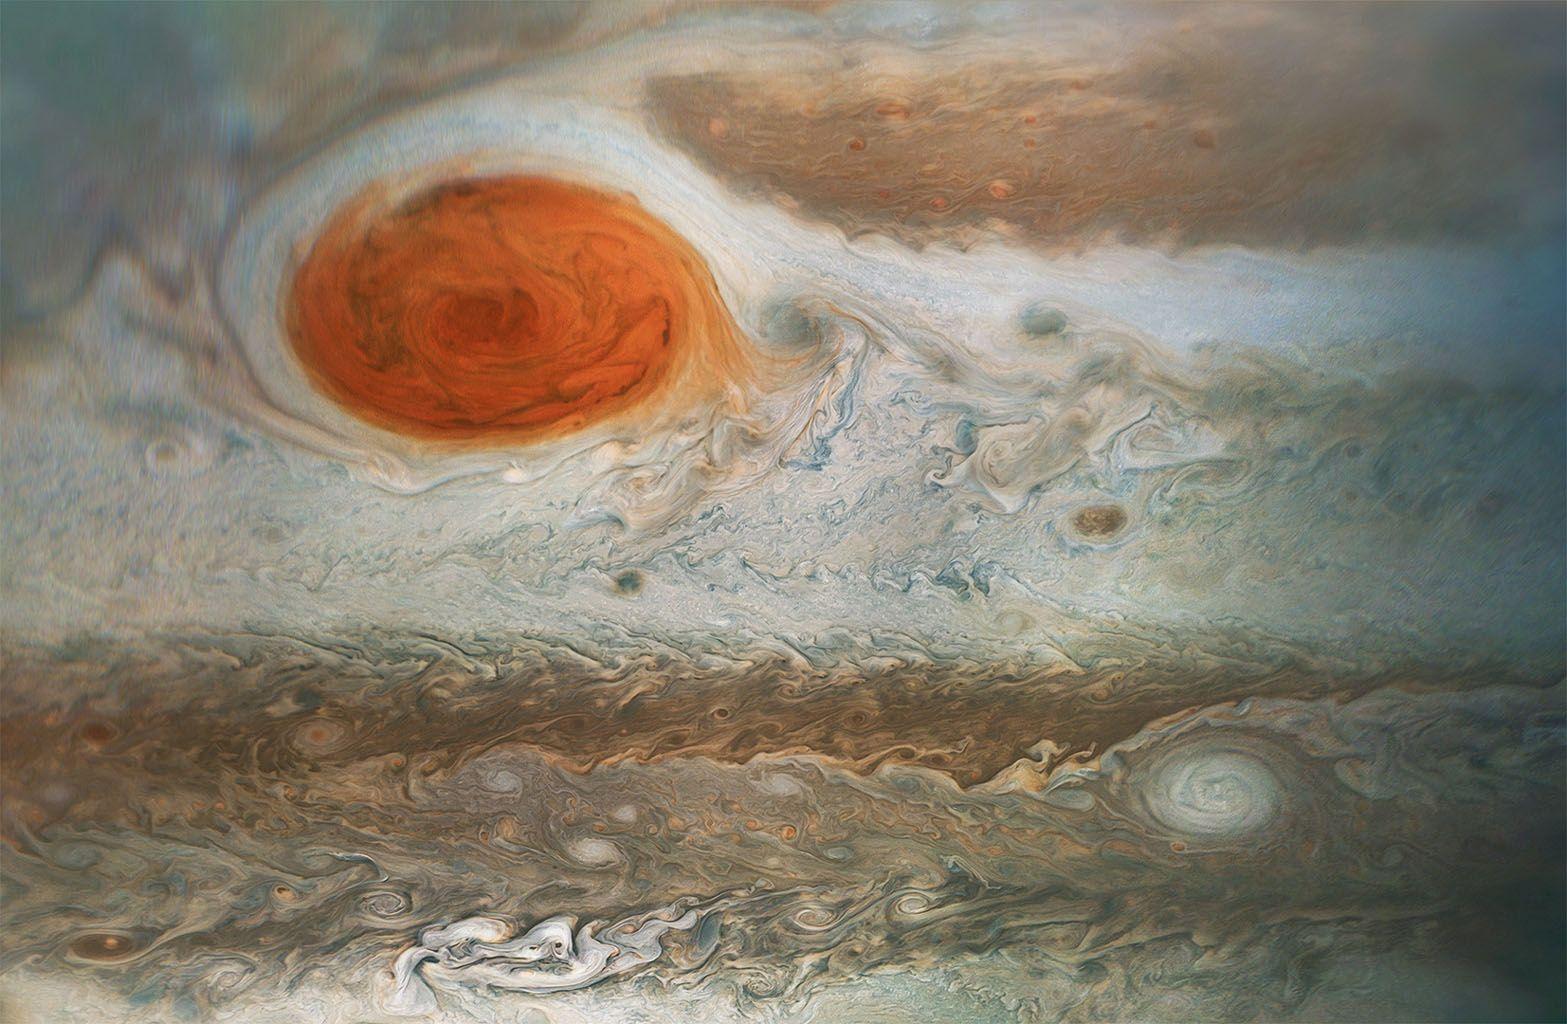 Great Red Spot storm heating Jupiter's atmosphere, says study |Solar System Jupiter Red Spot